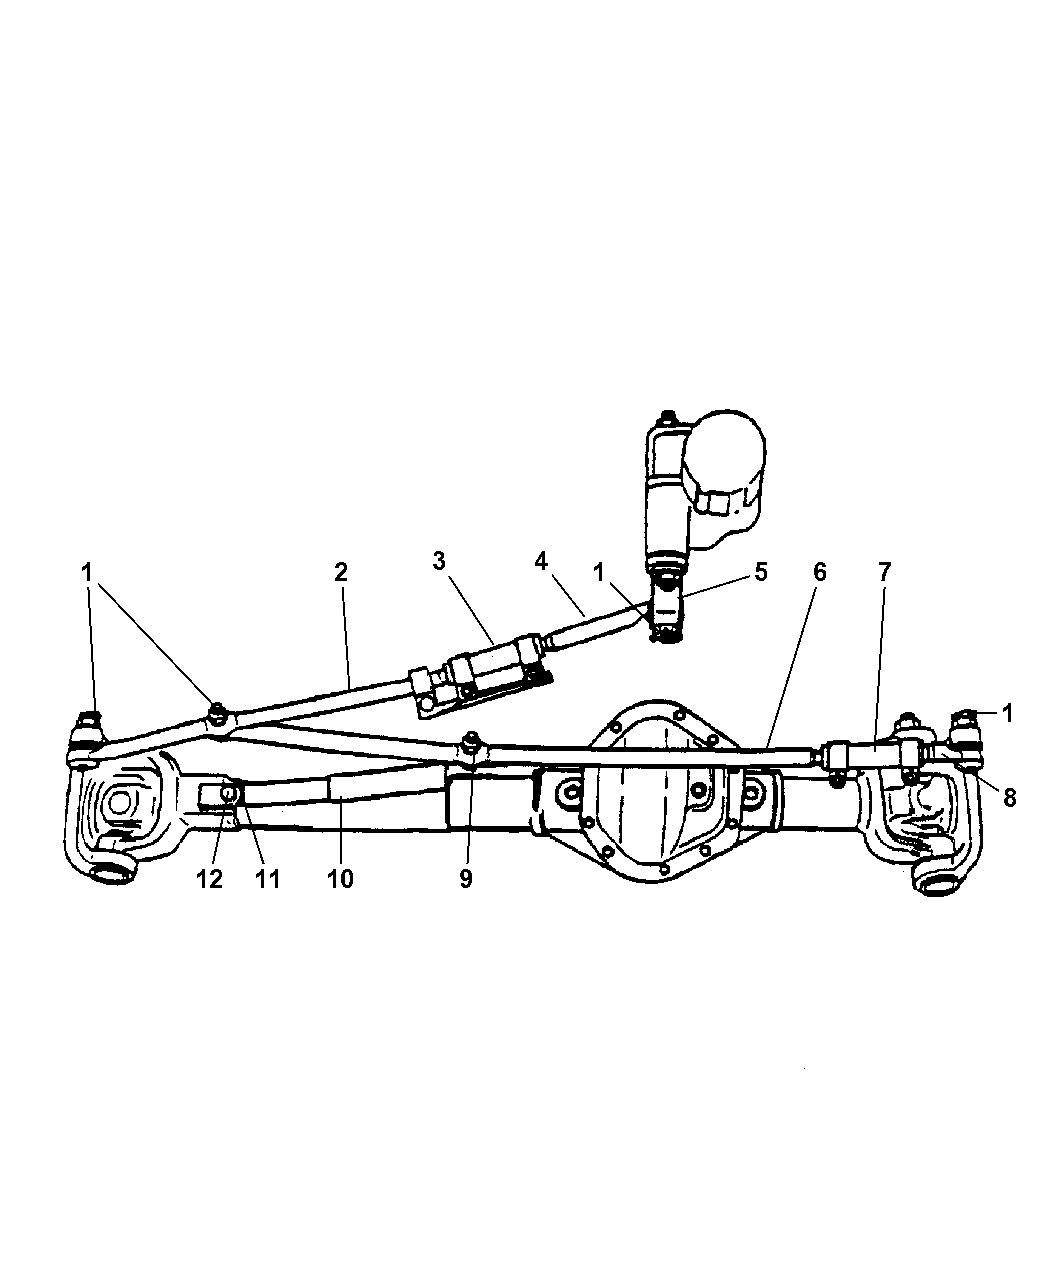 2004 Dodge Ram 2500 Steering Parts Diagram